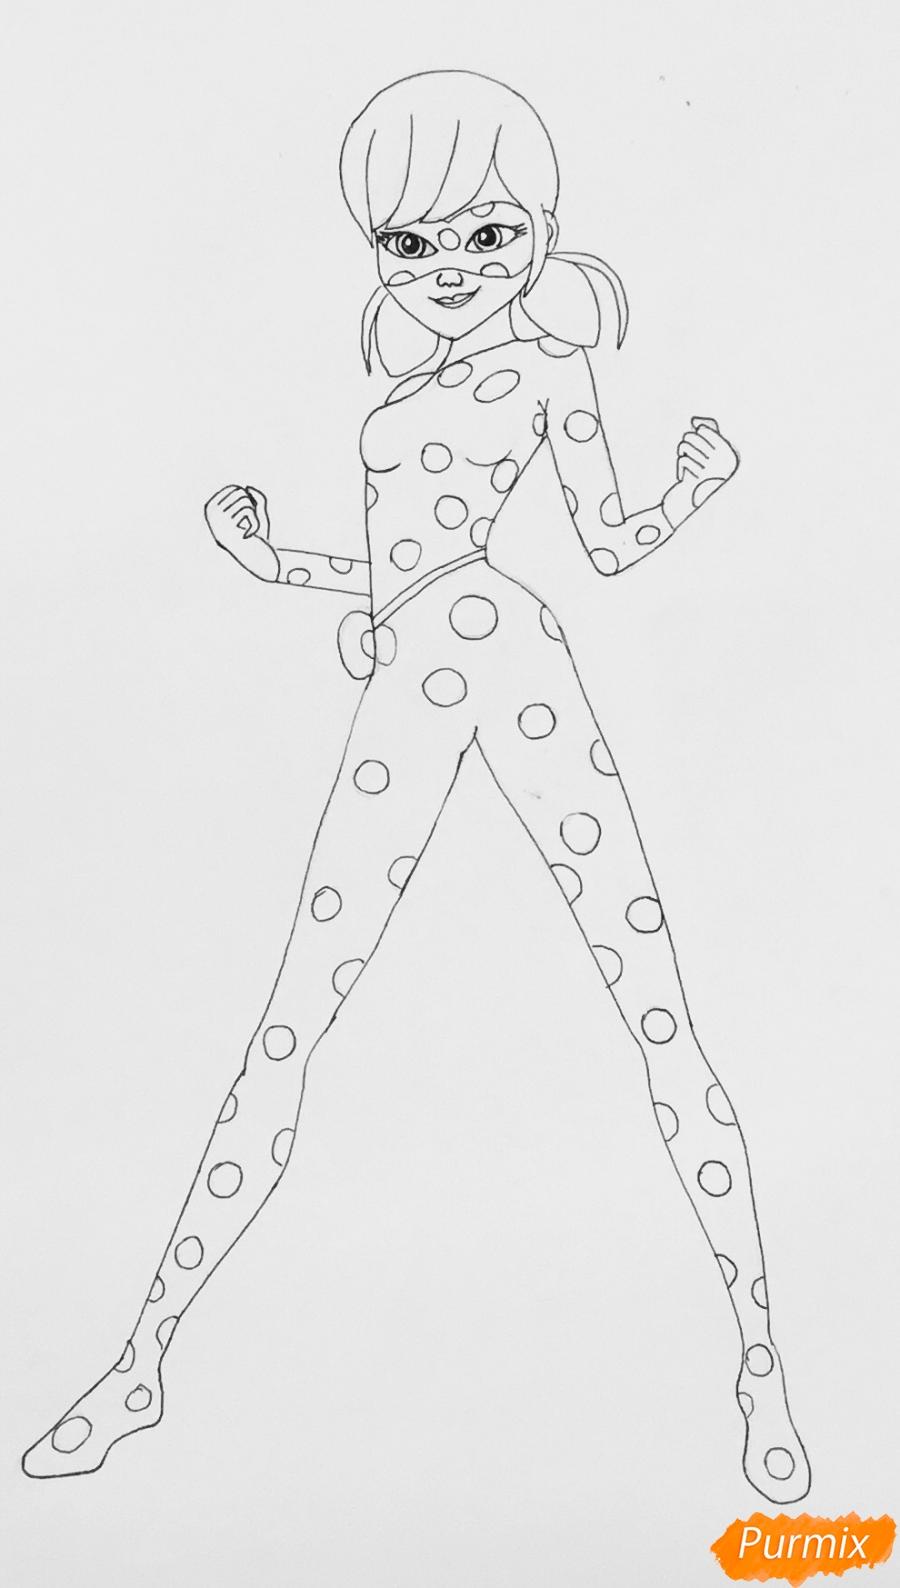 Рисуем Леди Баг из мультфильма Леди Баг и Супер Кот - фото 6